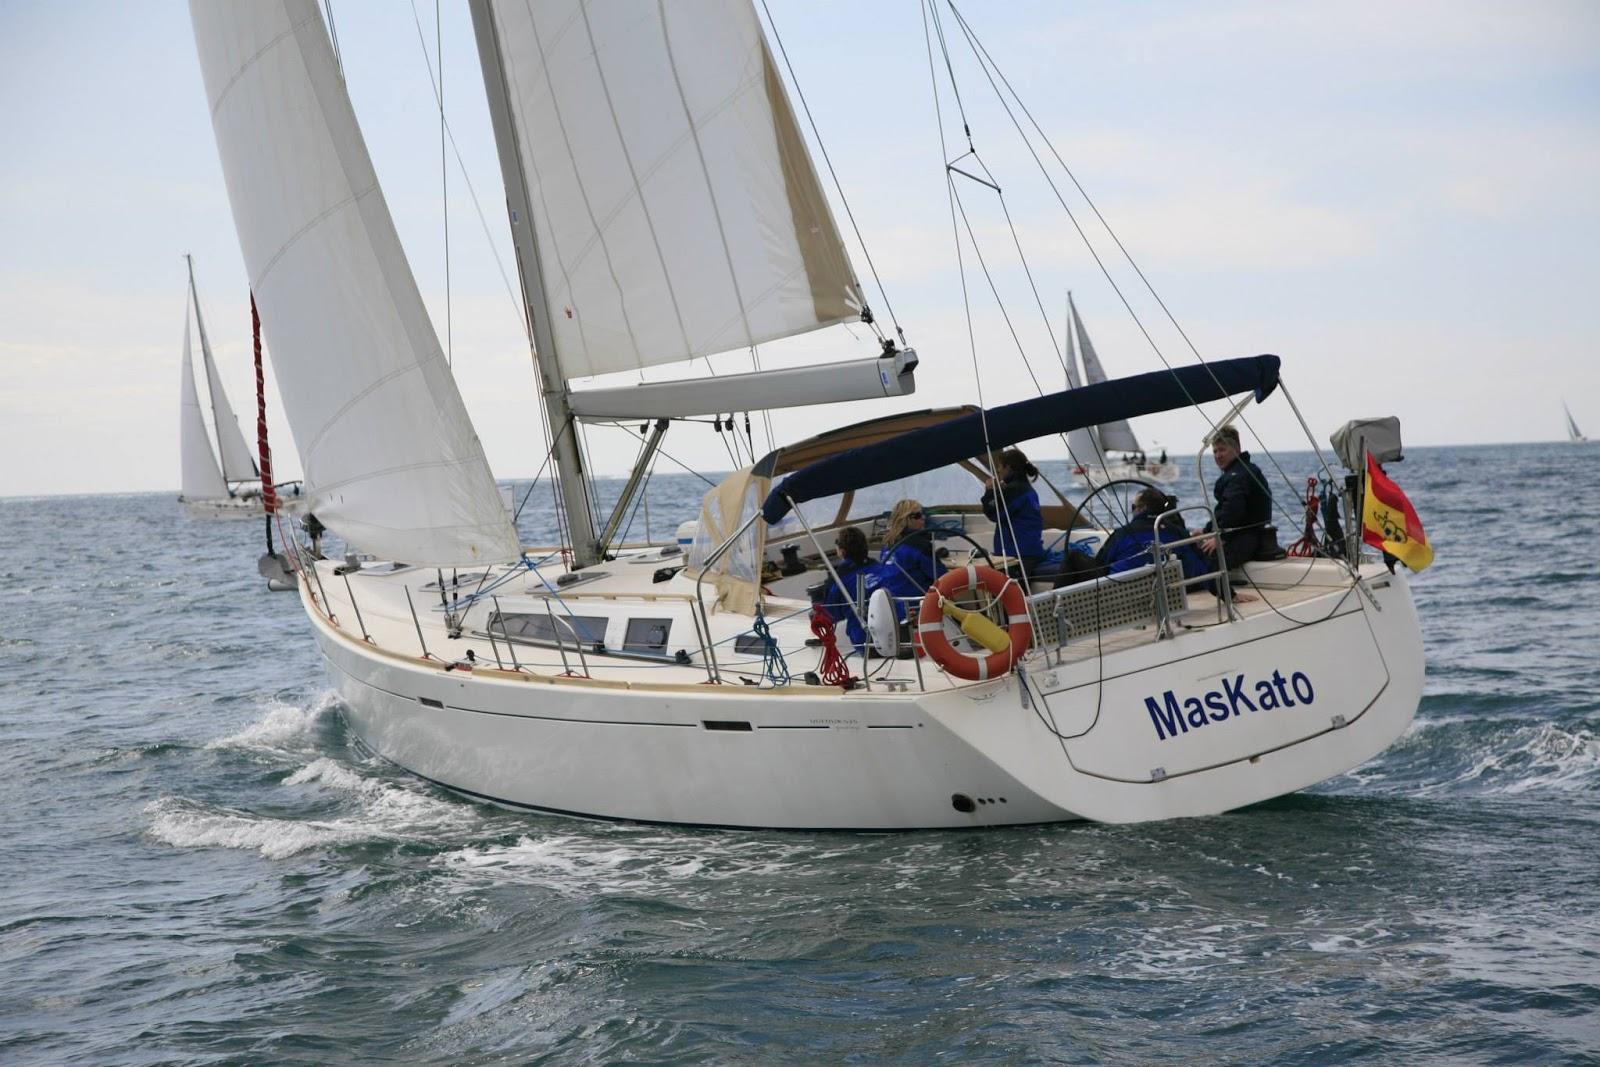 alquiler de veleros en ibiza. alquiler veleros ibiza. alquiler de barcos en ibiza. alquiler barcos ibiza. alquilar yates en ibiza. barcos de alquiler en ibiza